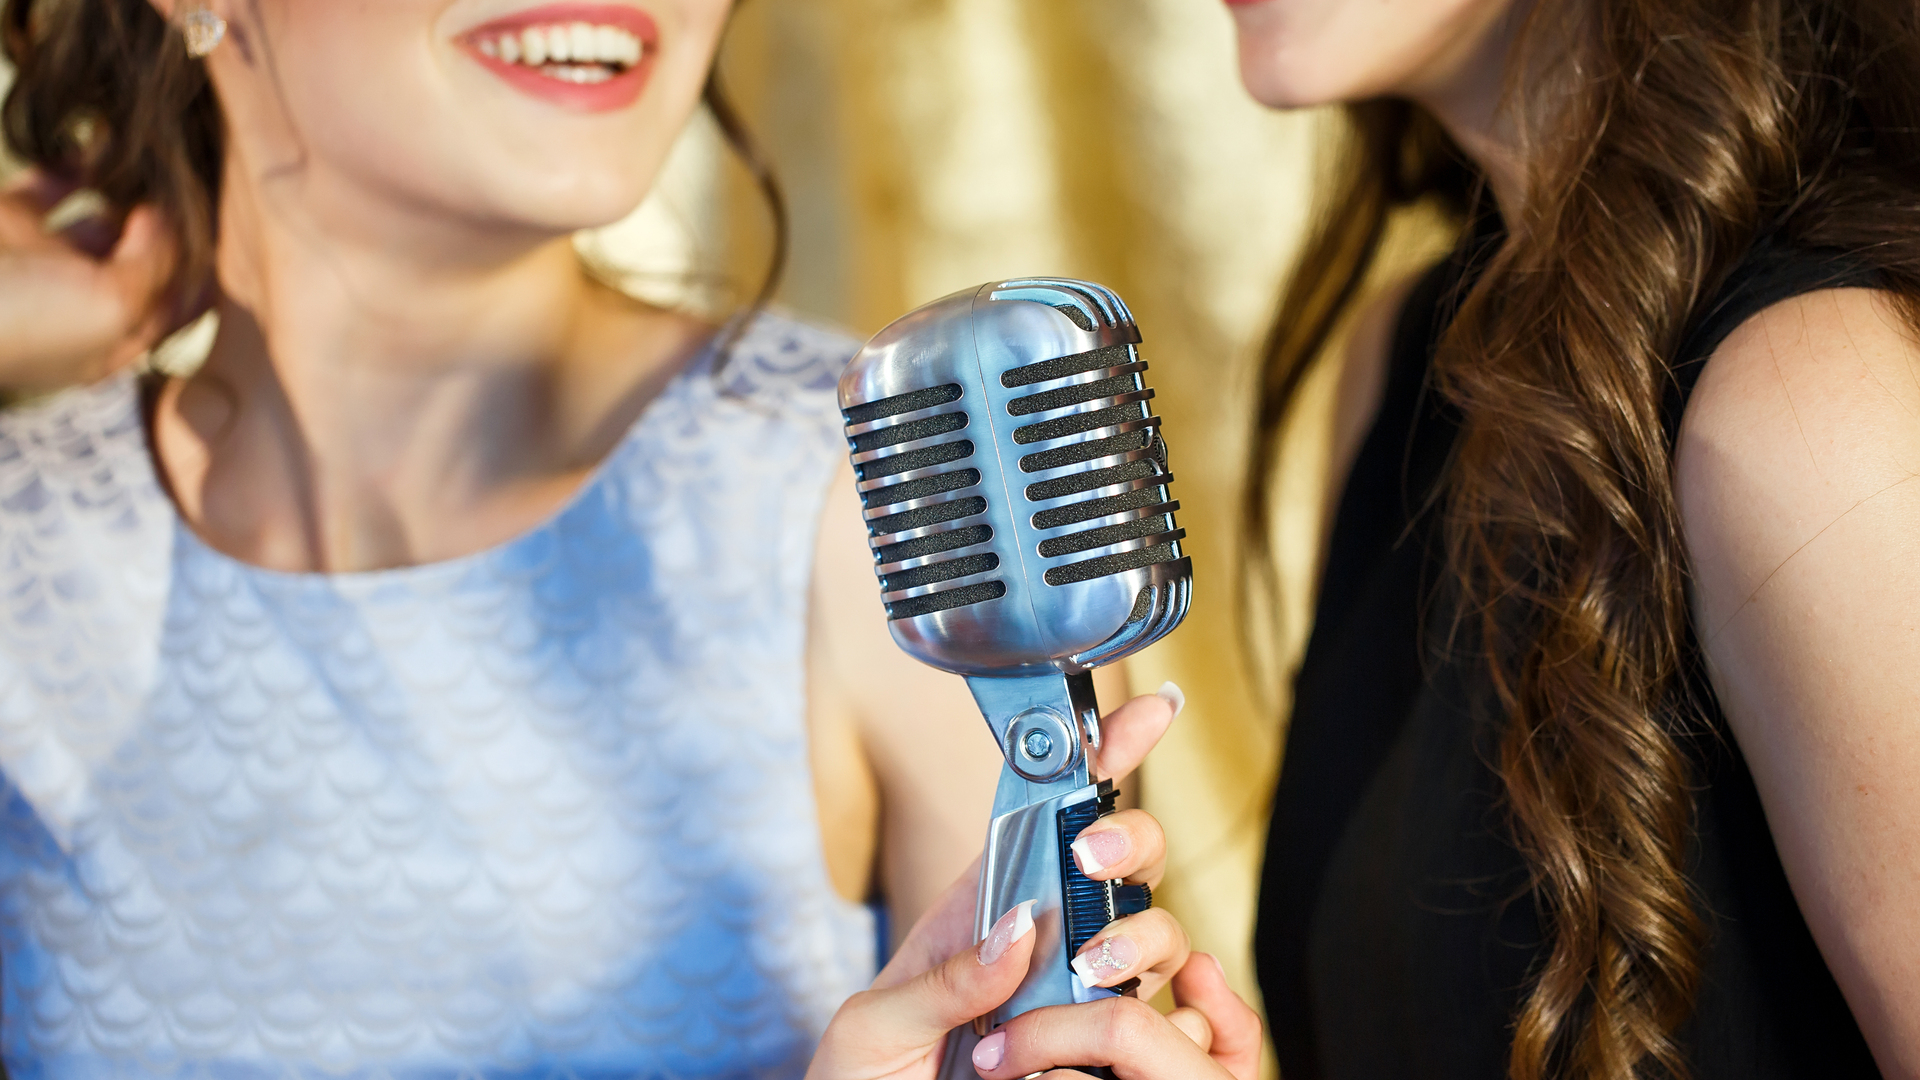 Alon chanter